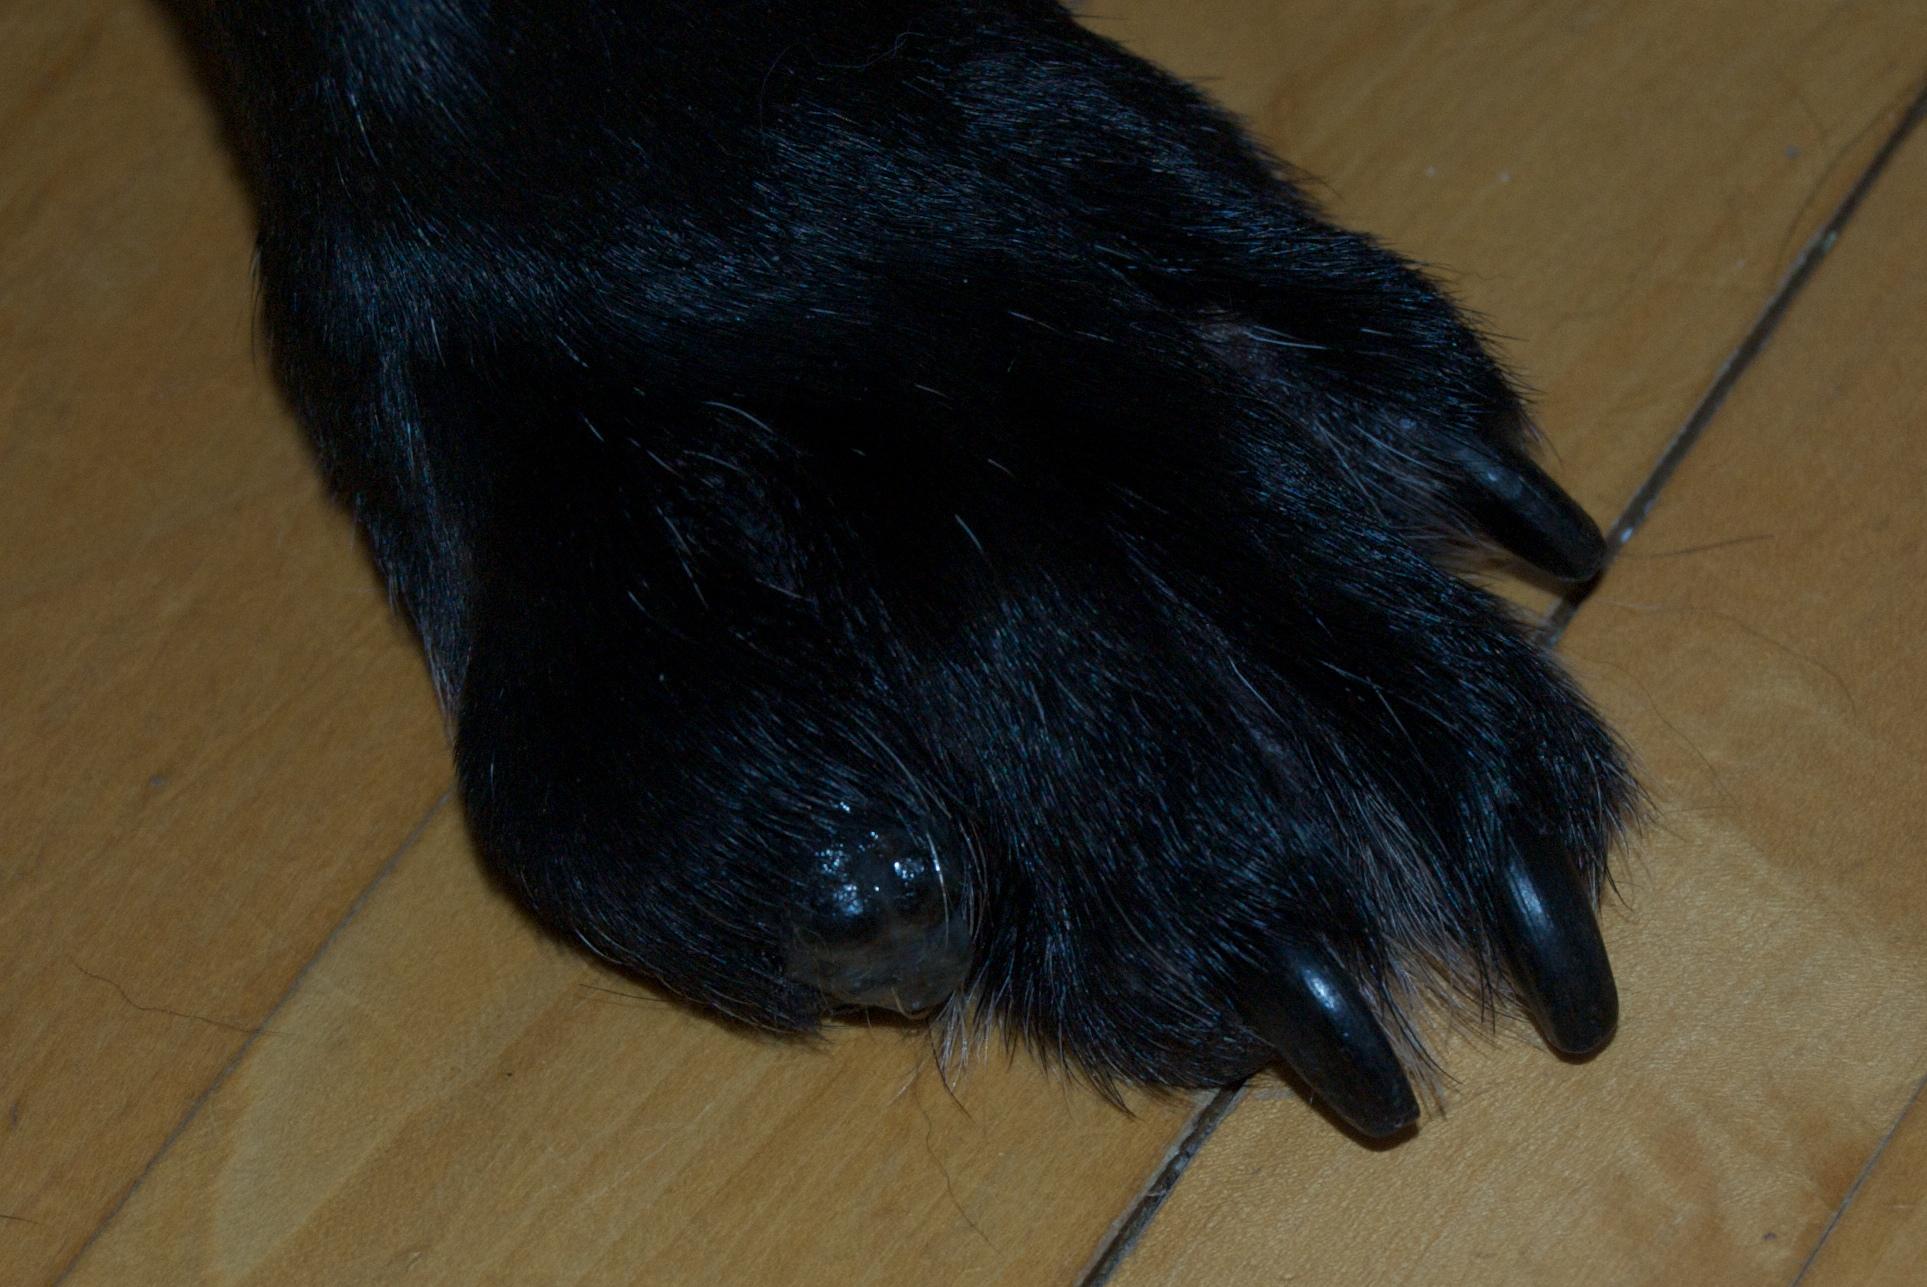 Image Result For Cancer Symptoms Dogs